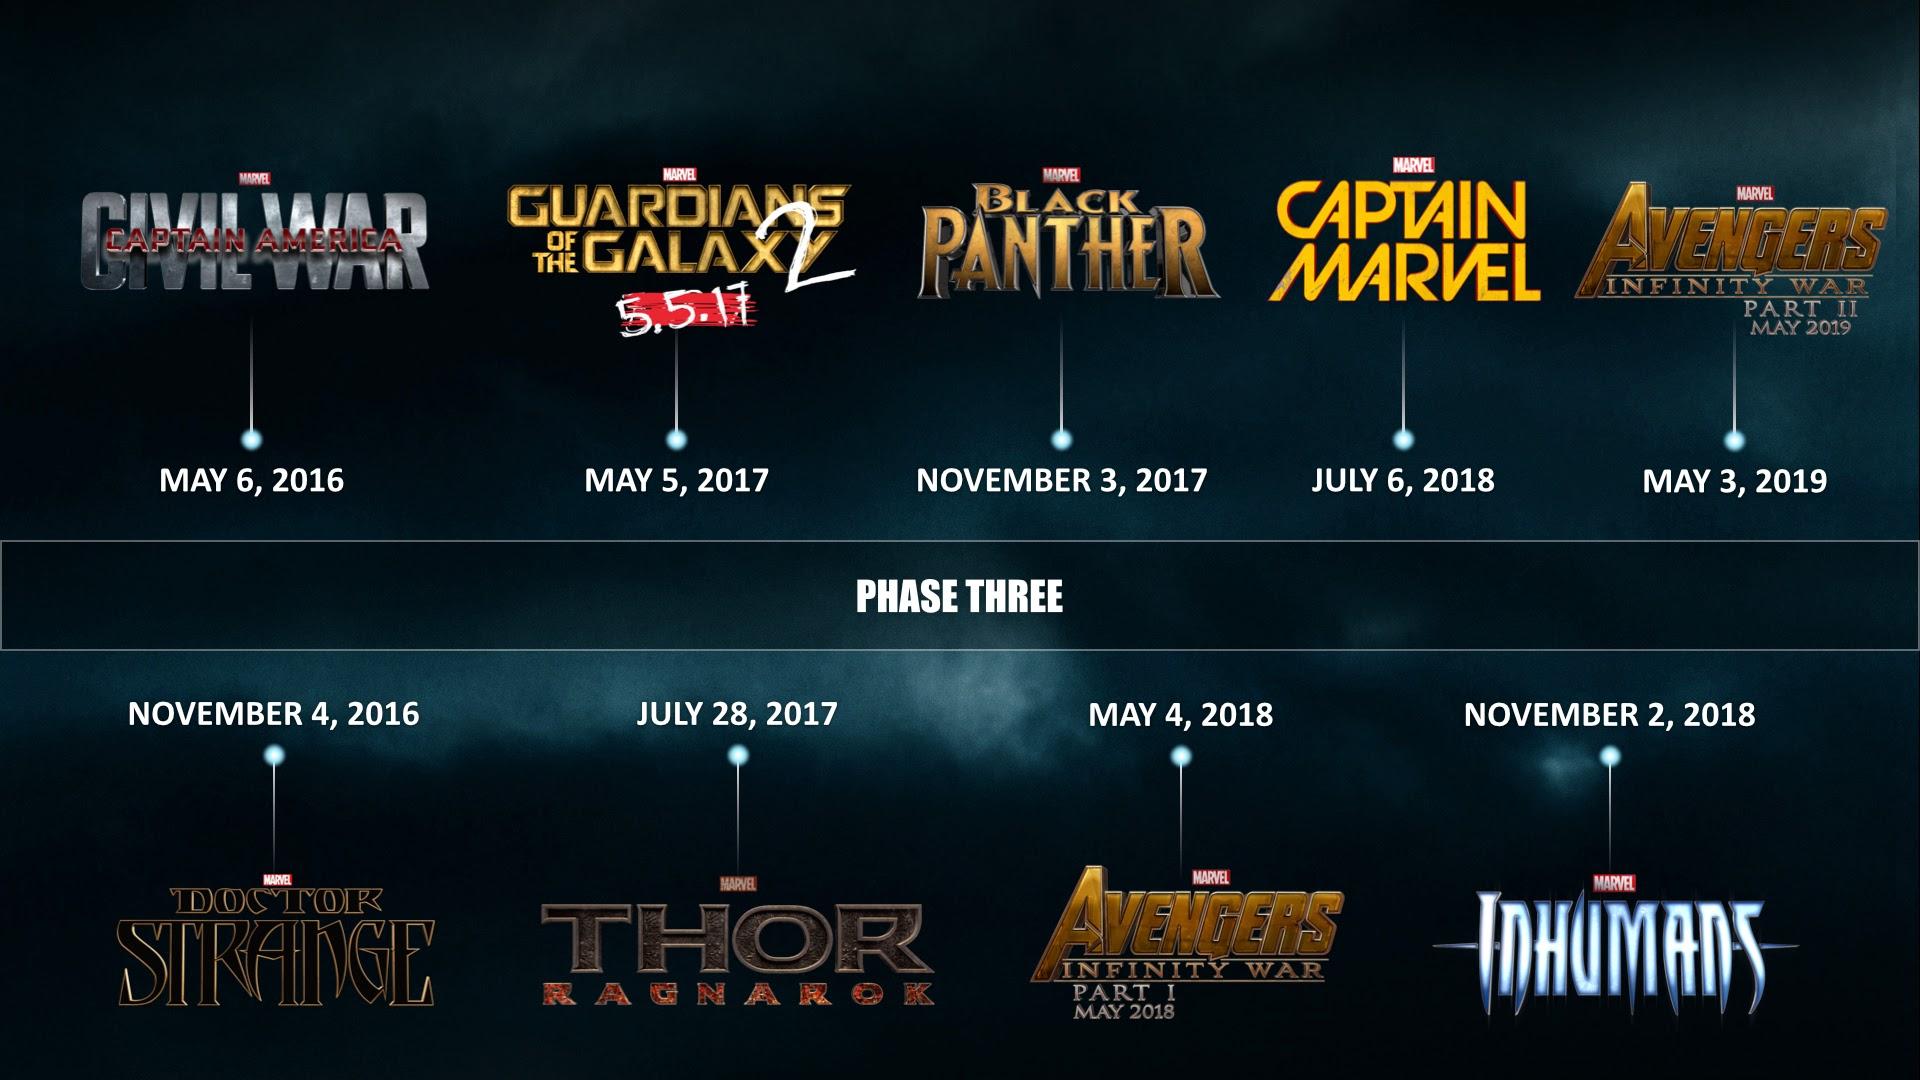 The Avengers 4 timeline